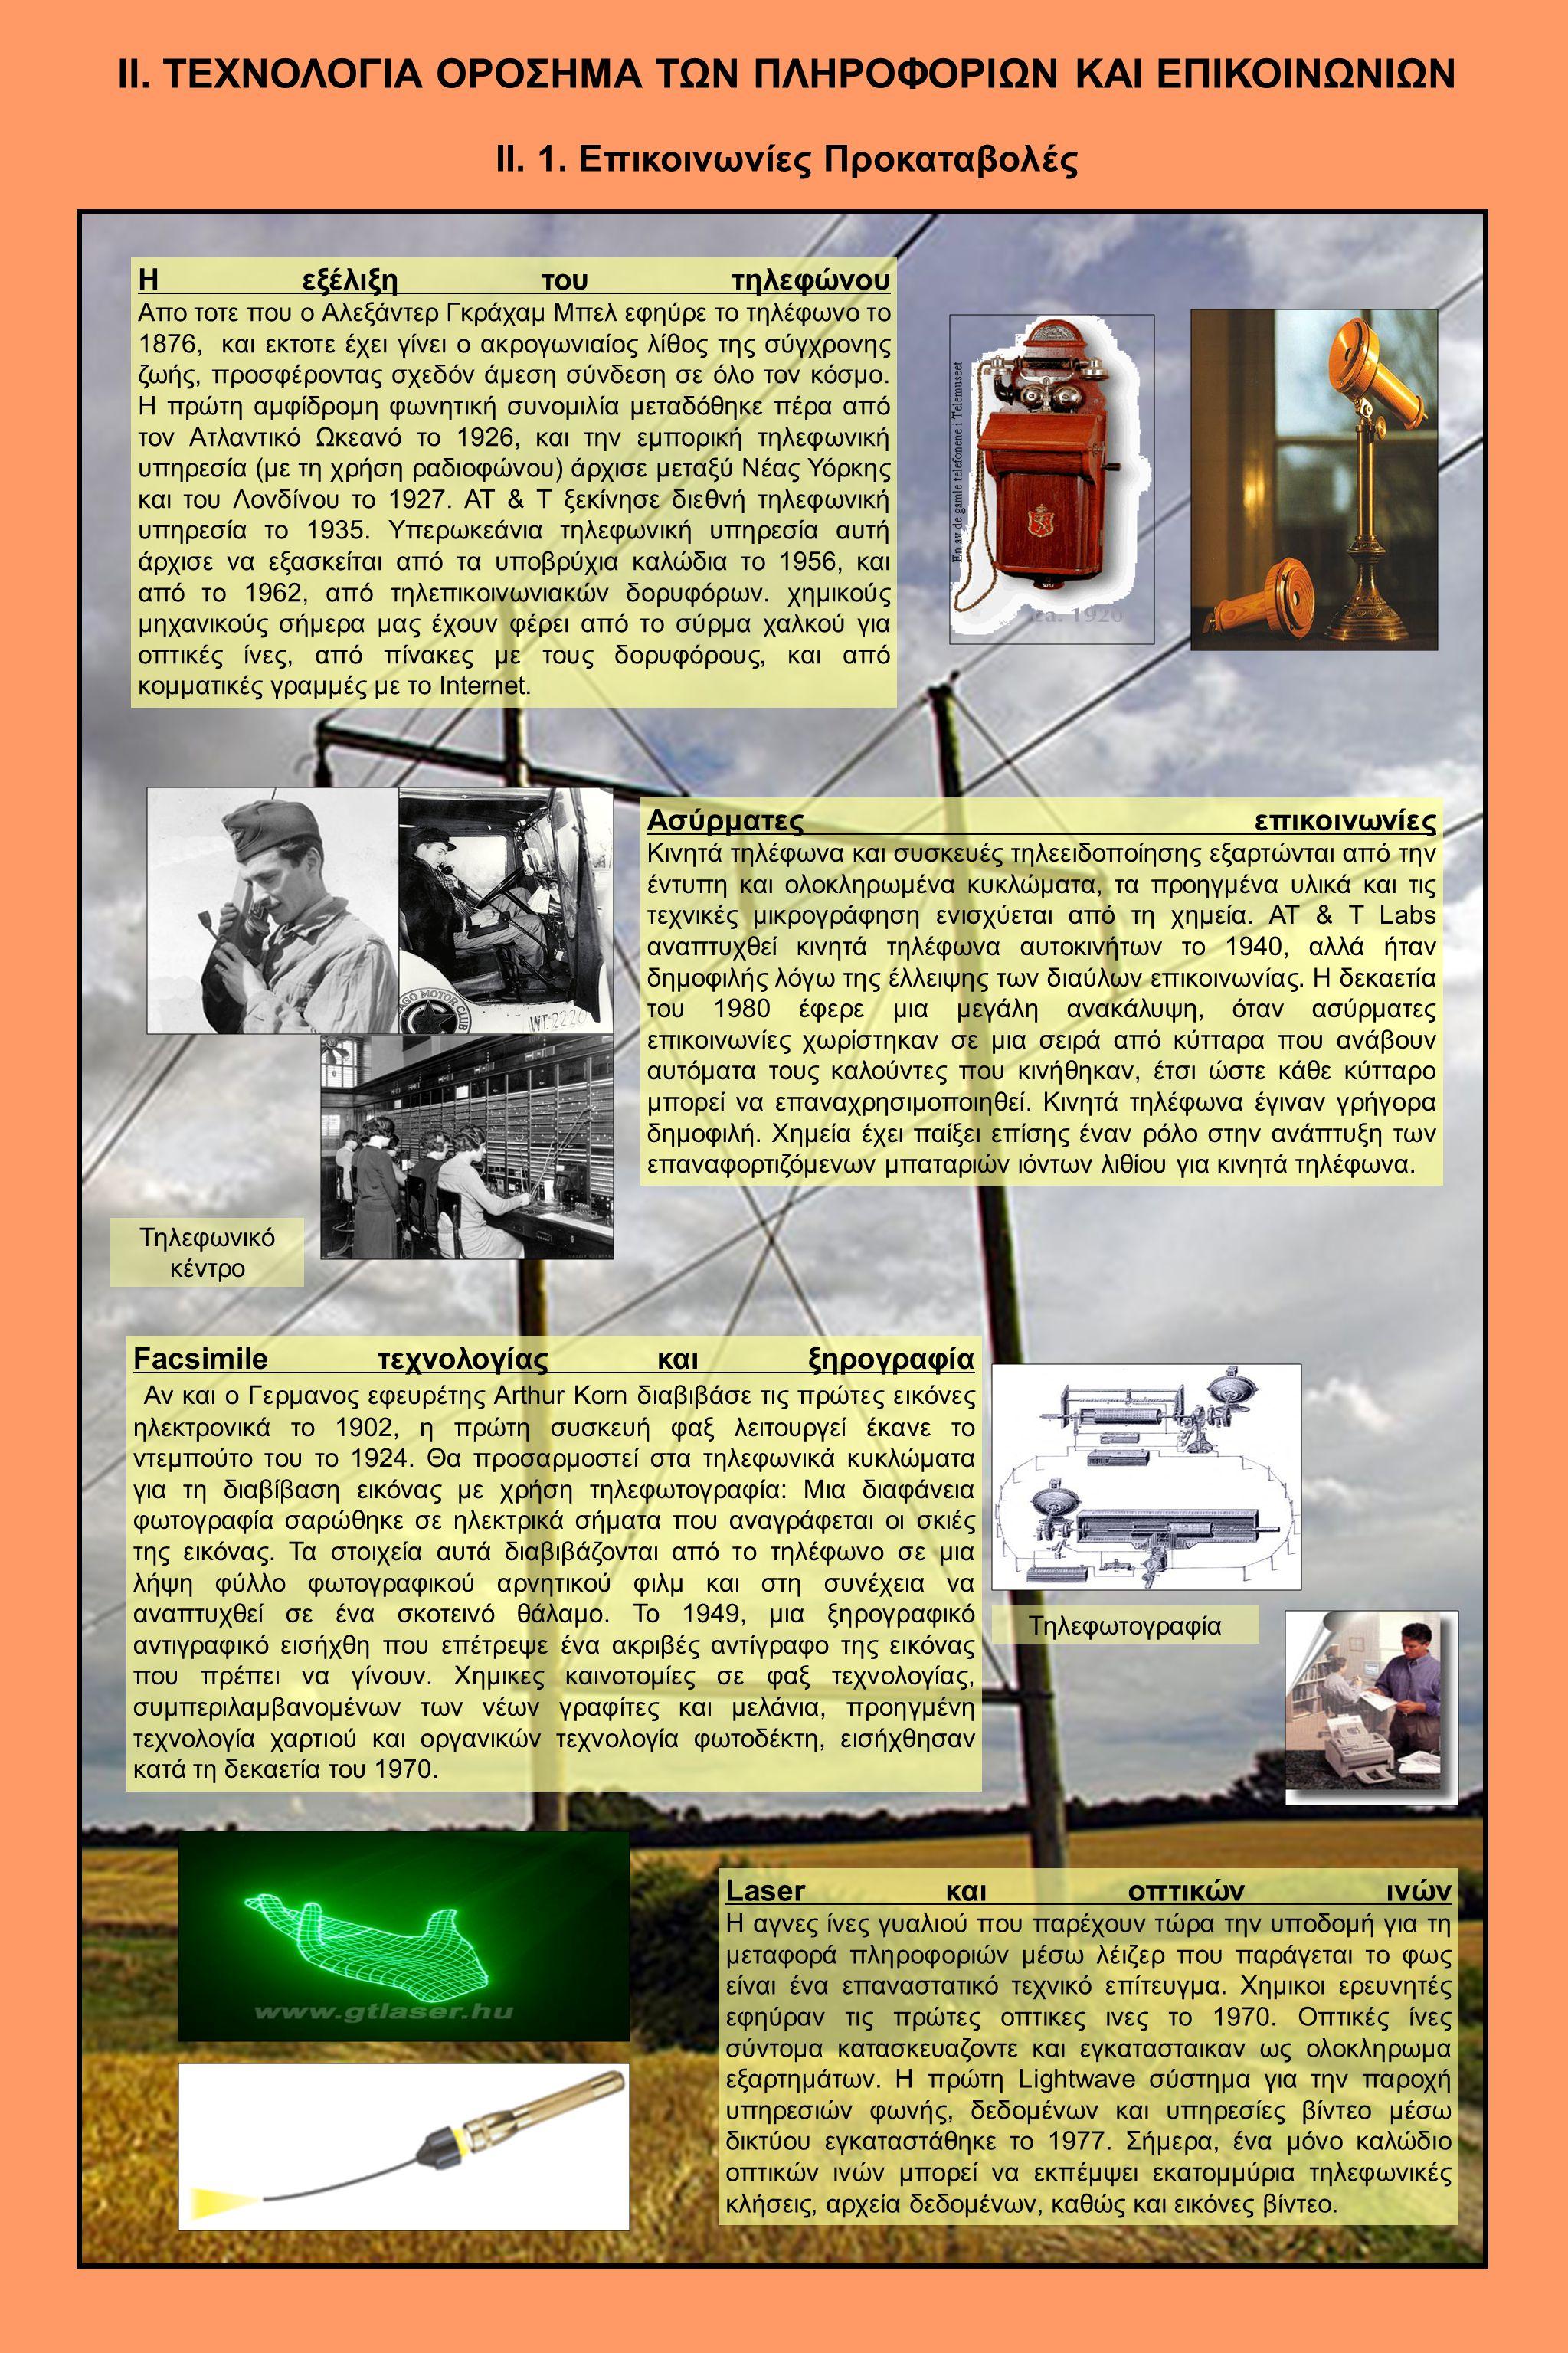 II. 1. Επικοινωνίες Προκαταβολές Η εξέλιξη του τηλεφώνου Απο τοτε που ο Αλεξάντερ Γκράχαμ Μπελ εφηύρε το τηλέφωνο το 1876, και εκτοτε έχει γίνει ο ακρ